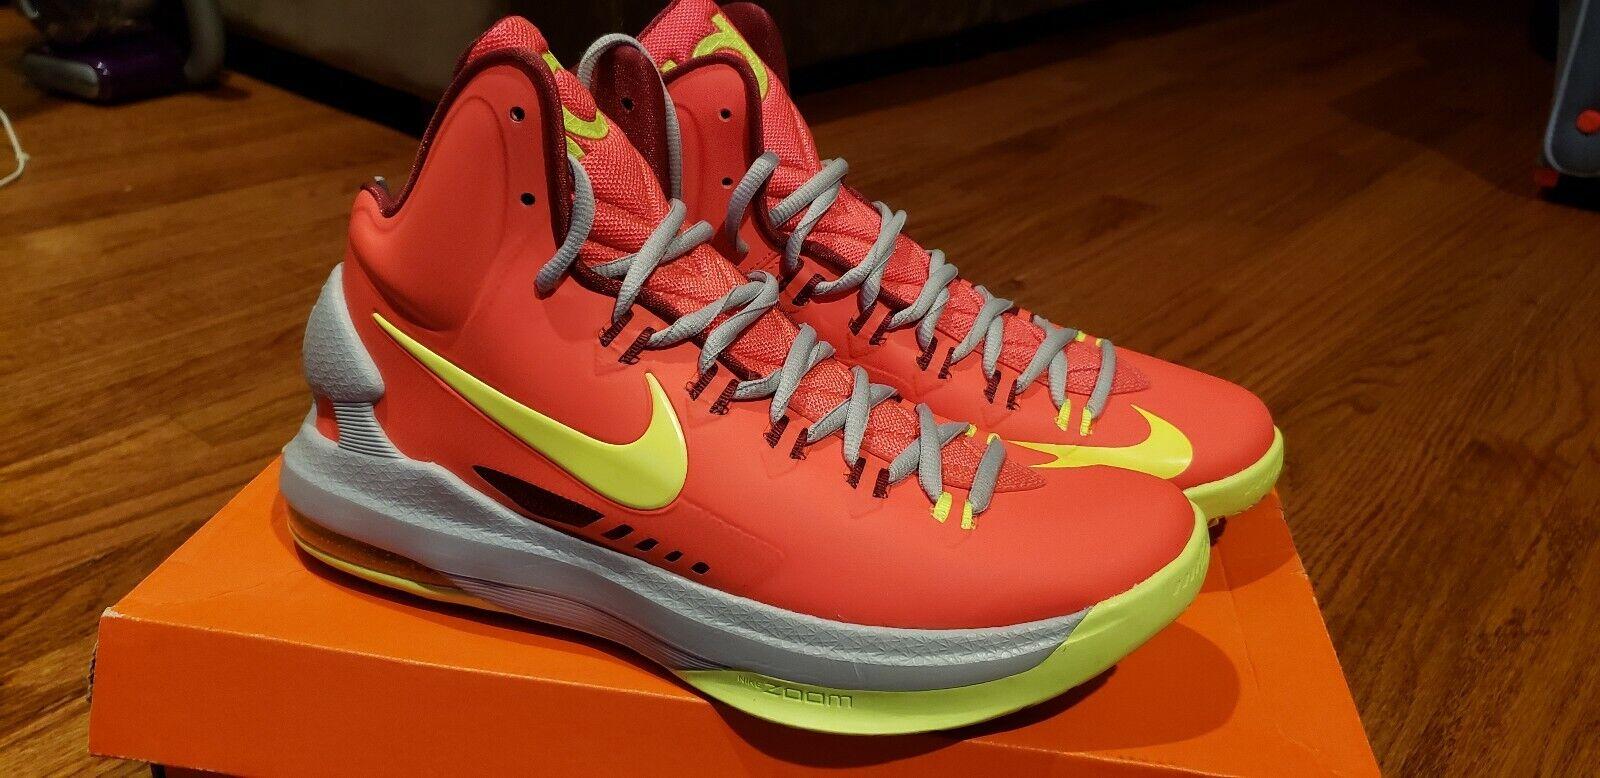 Nike Kd V DMV Size 9